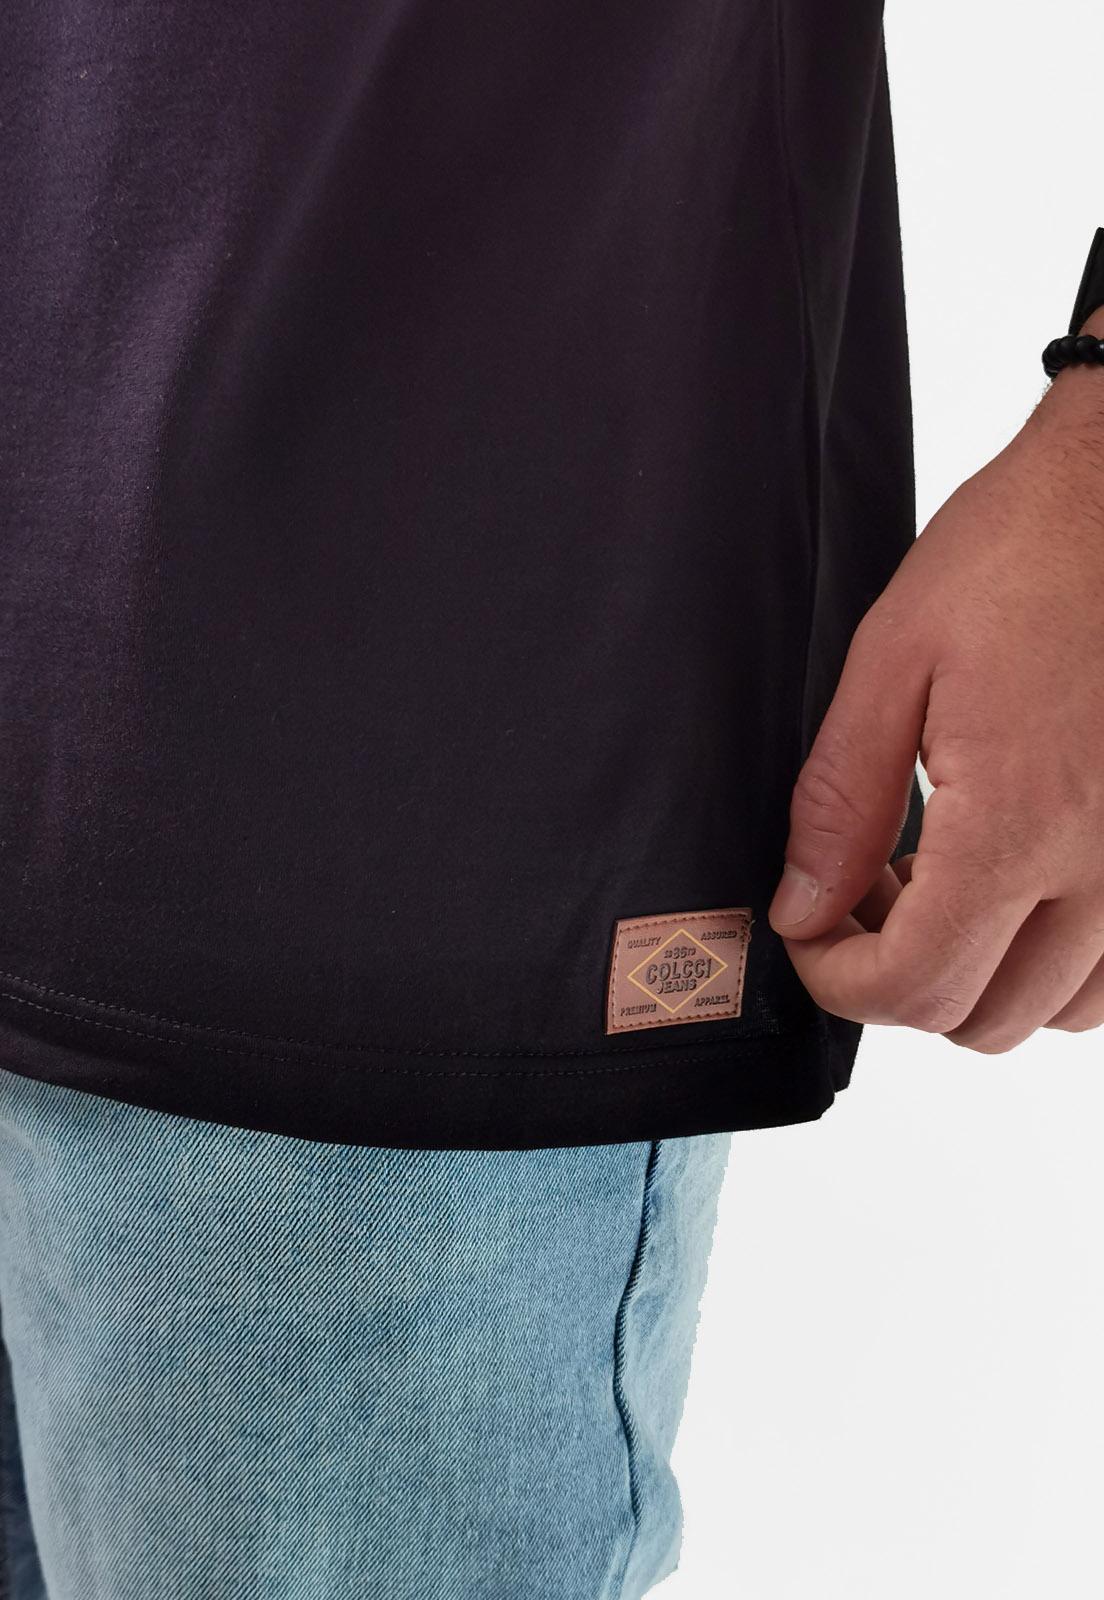 Camiseta Colcci Preto Lobo